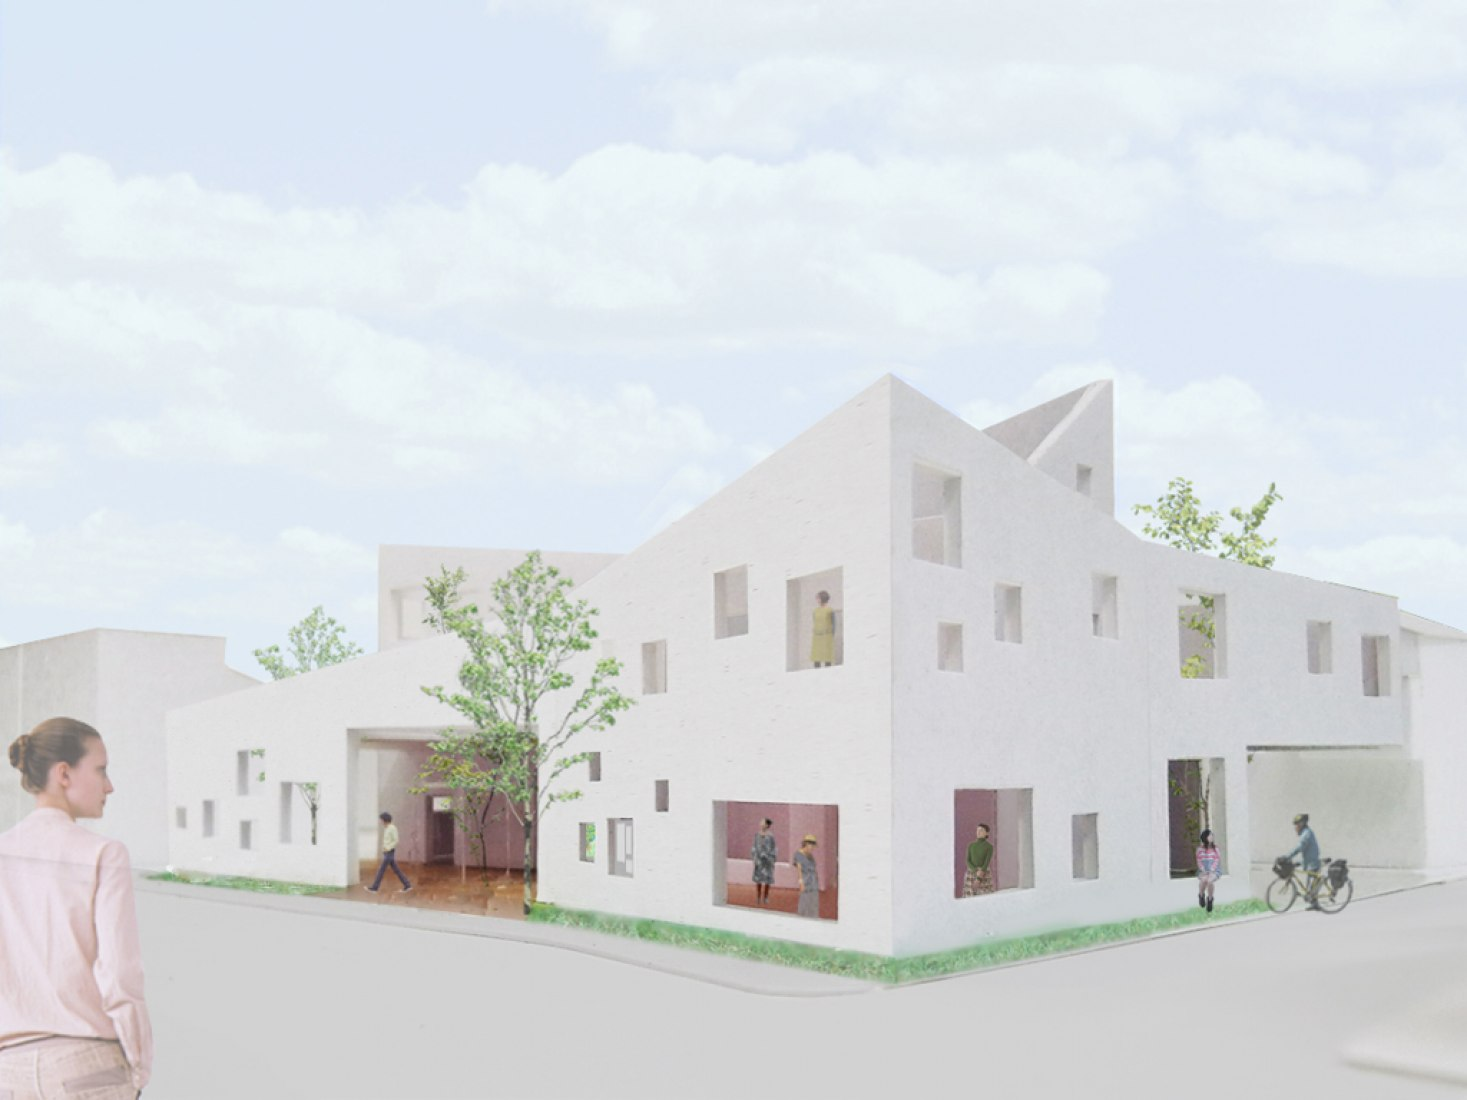 Exterior photomontage, MMST by Torafu Architects. © Torafu Architects.